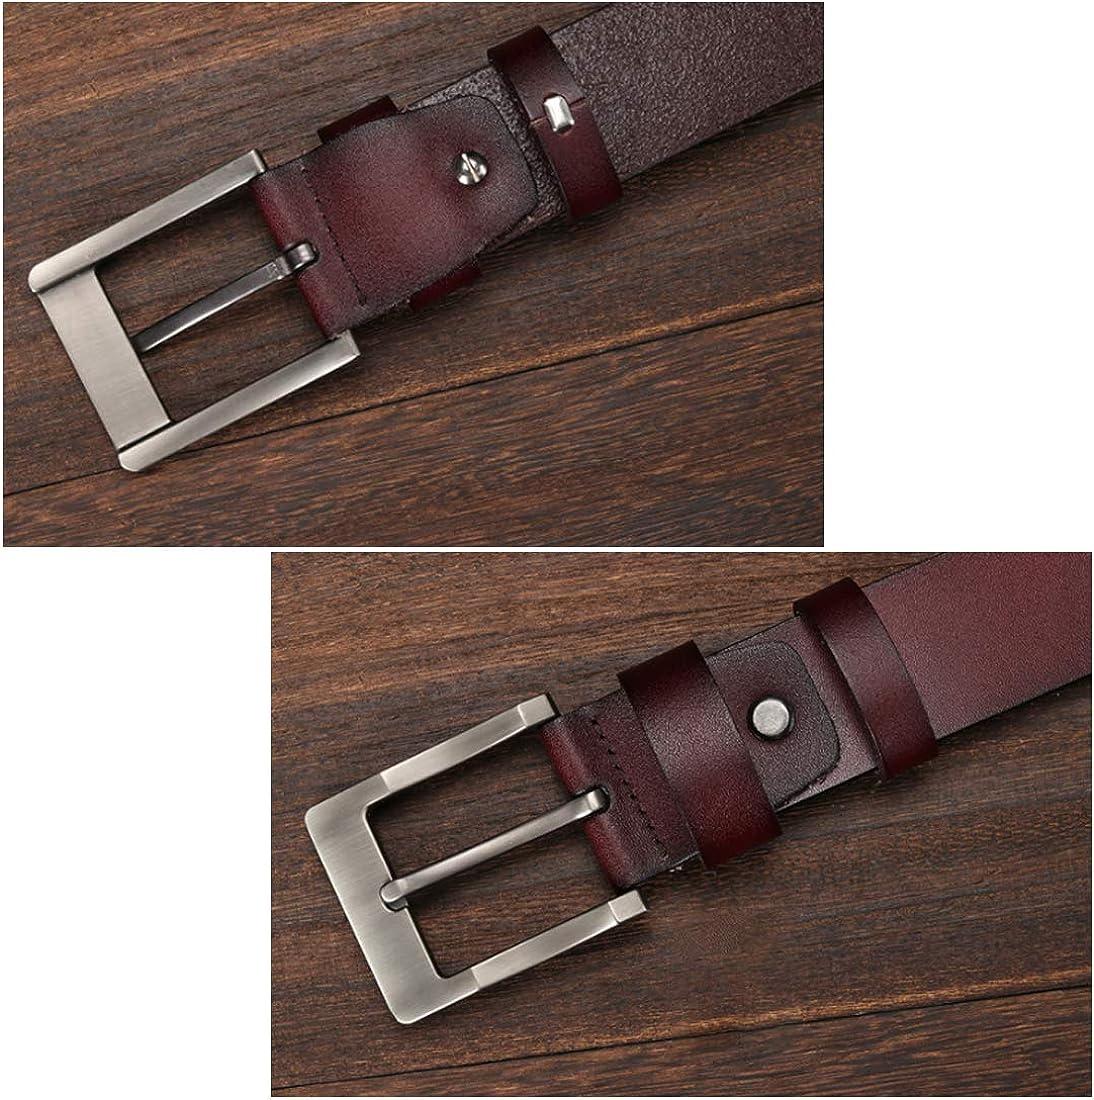 Huicai Mens belt leather belt anti-slip man waist belt pant belt